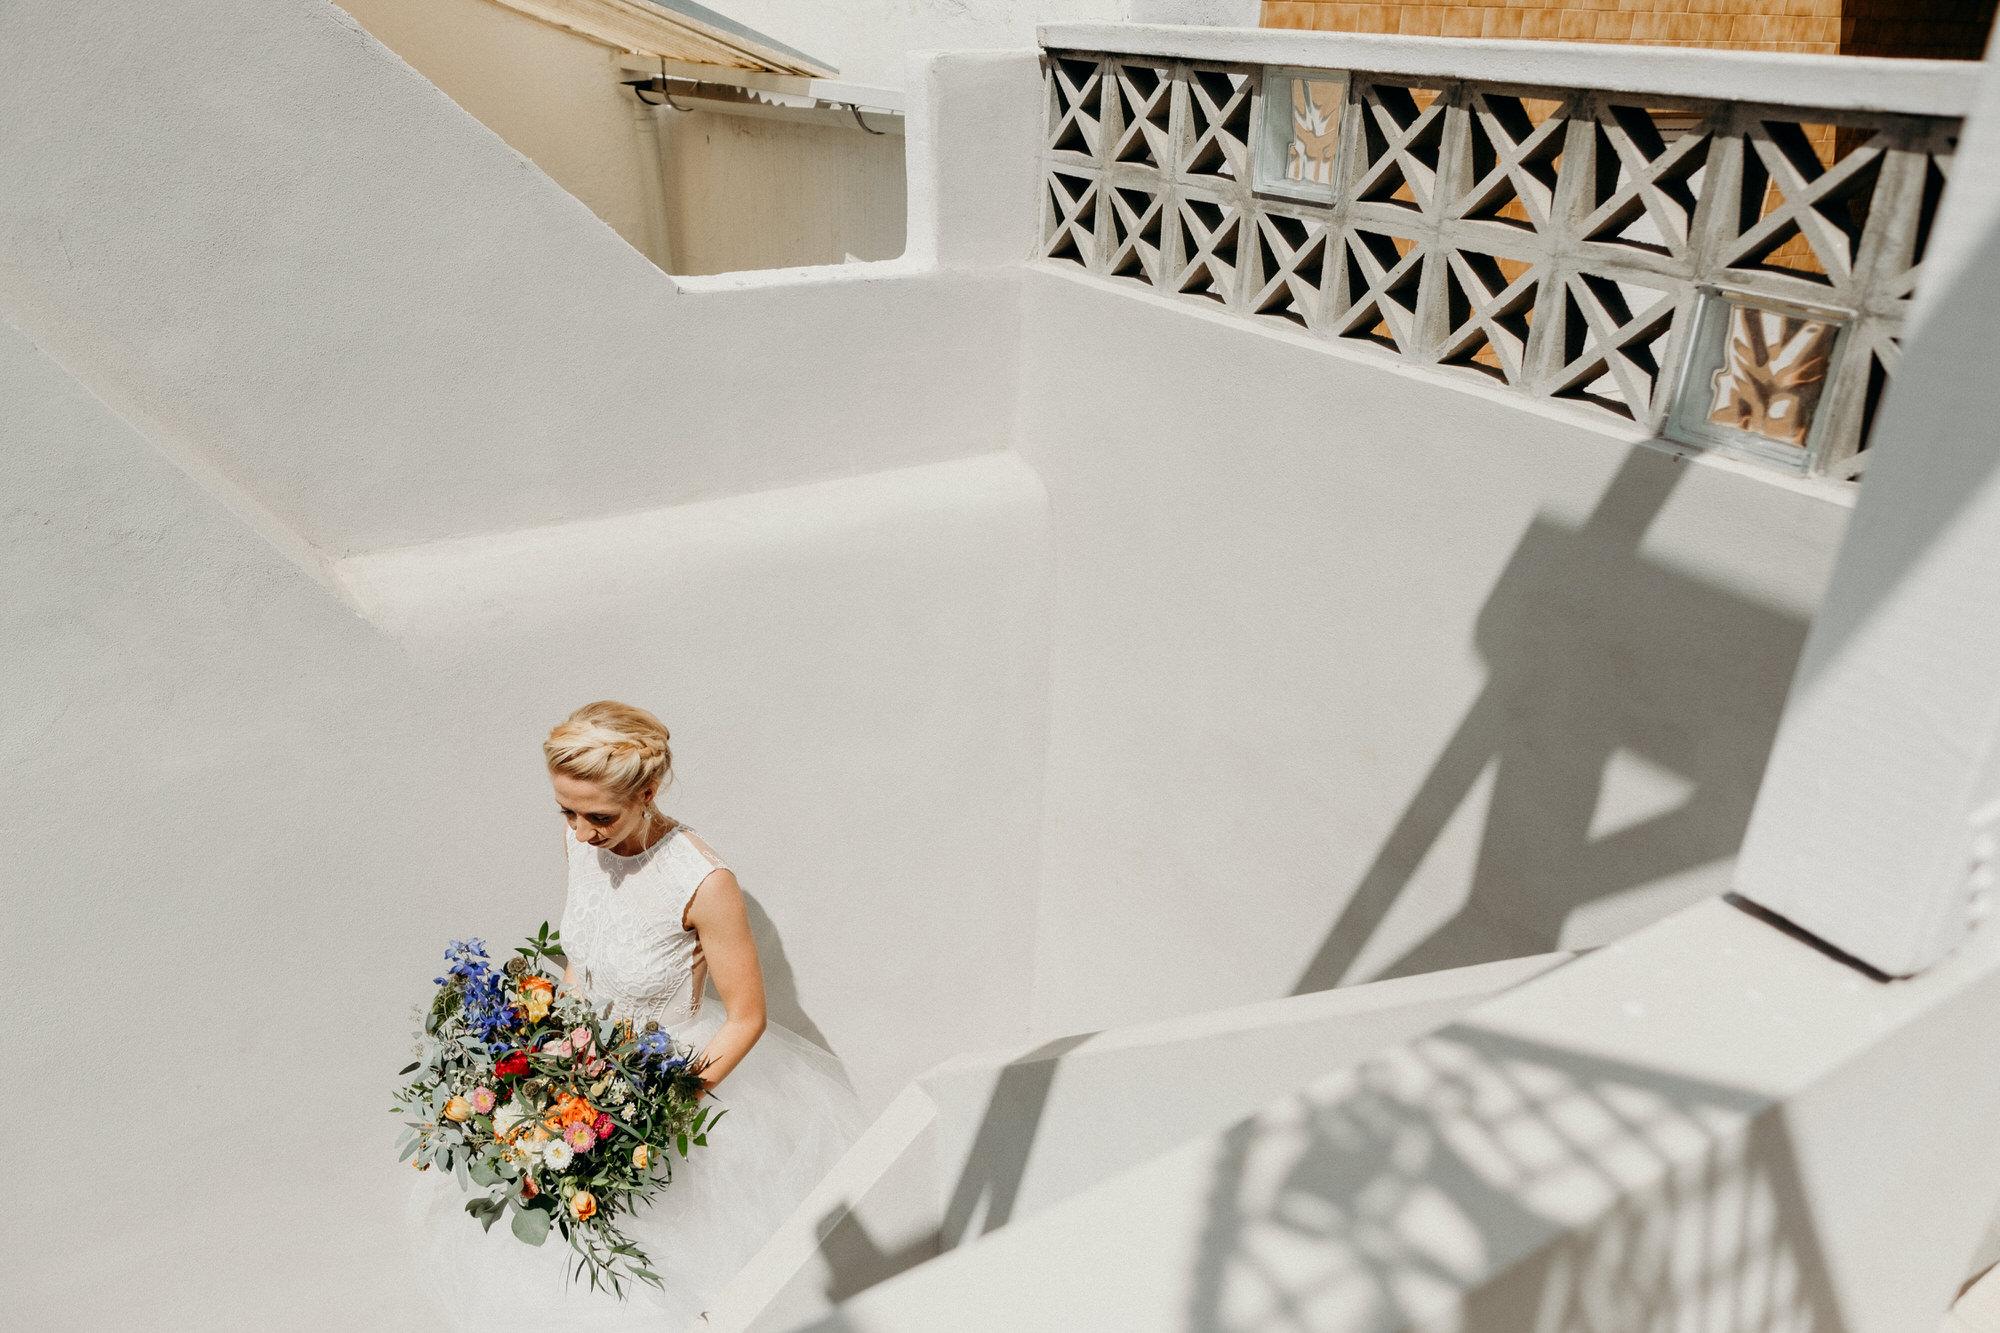 EuanR-Weddings-Header-002.jpg